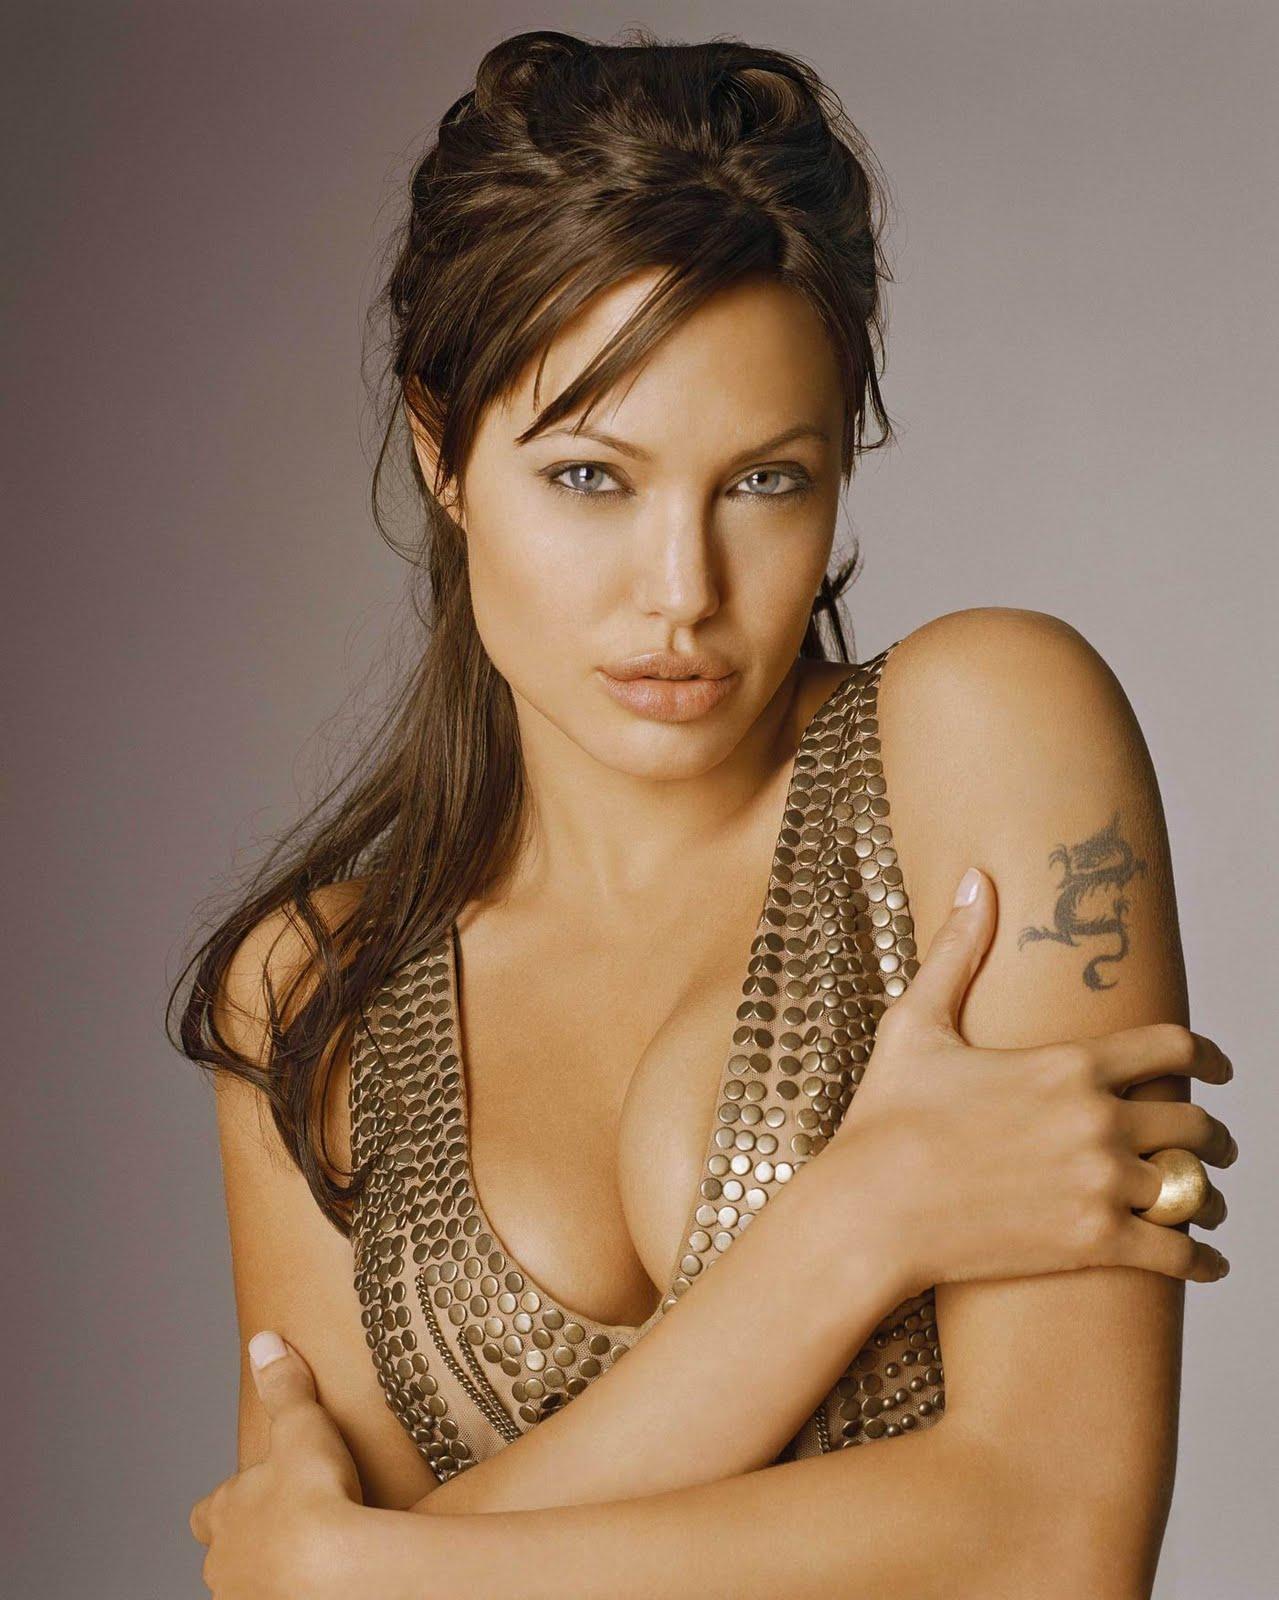 http://2.bp.blogspot.com/-cwUN-rdFhNY/TetRgn3m0cI/AAAAAAAAB5E/RrDjnFWuwDA/s1600/Angelina-Jolie-Sexy-Hot.jpg